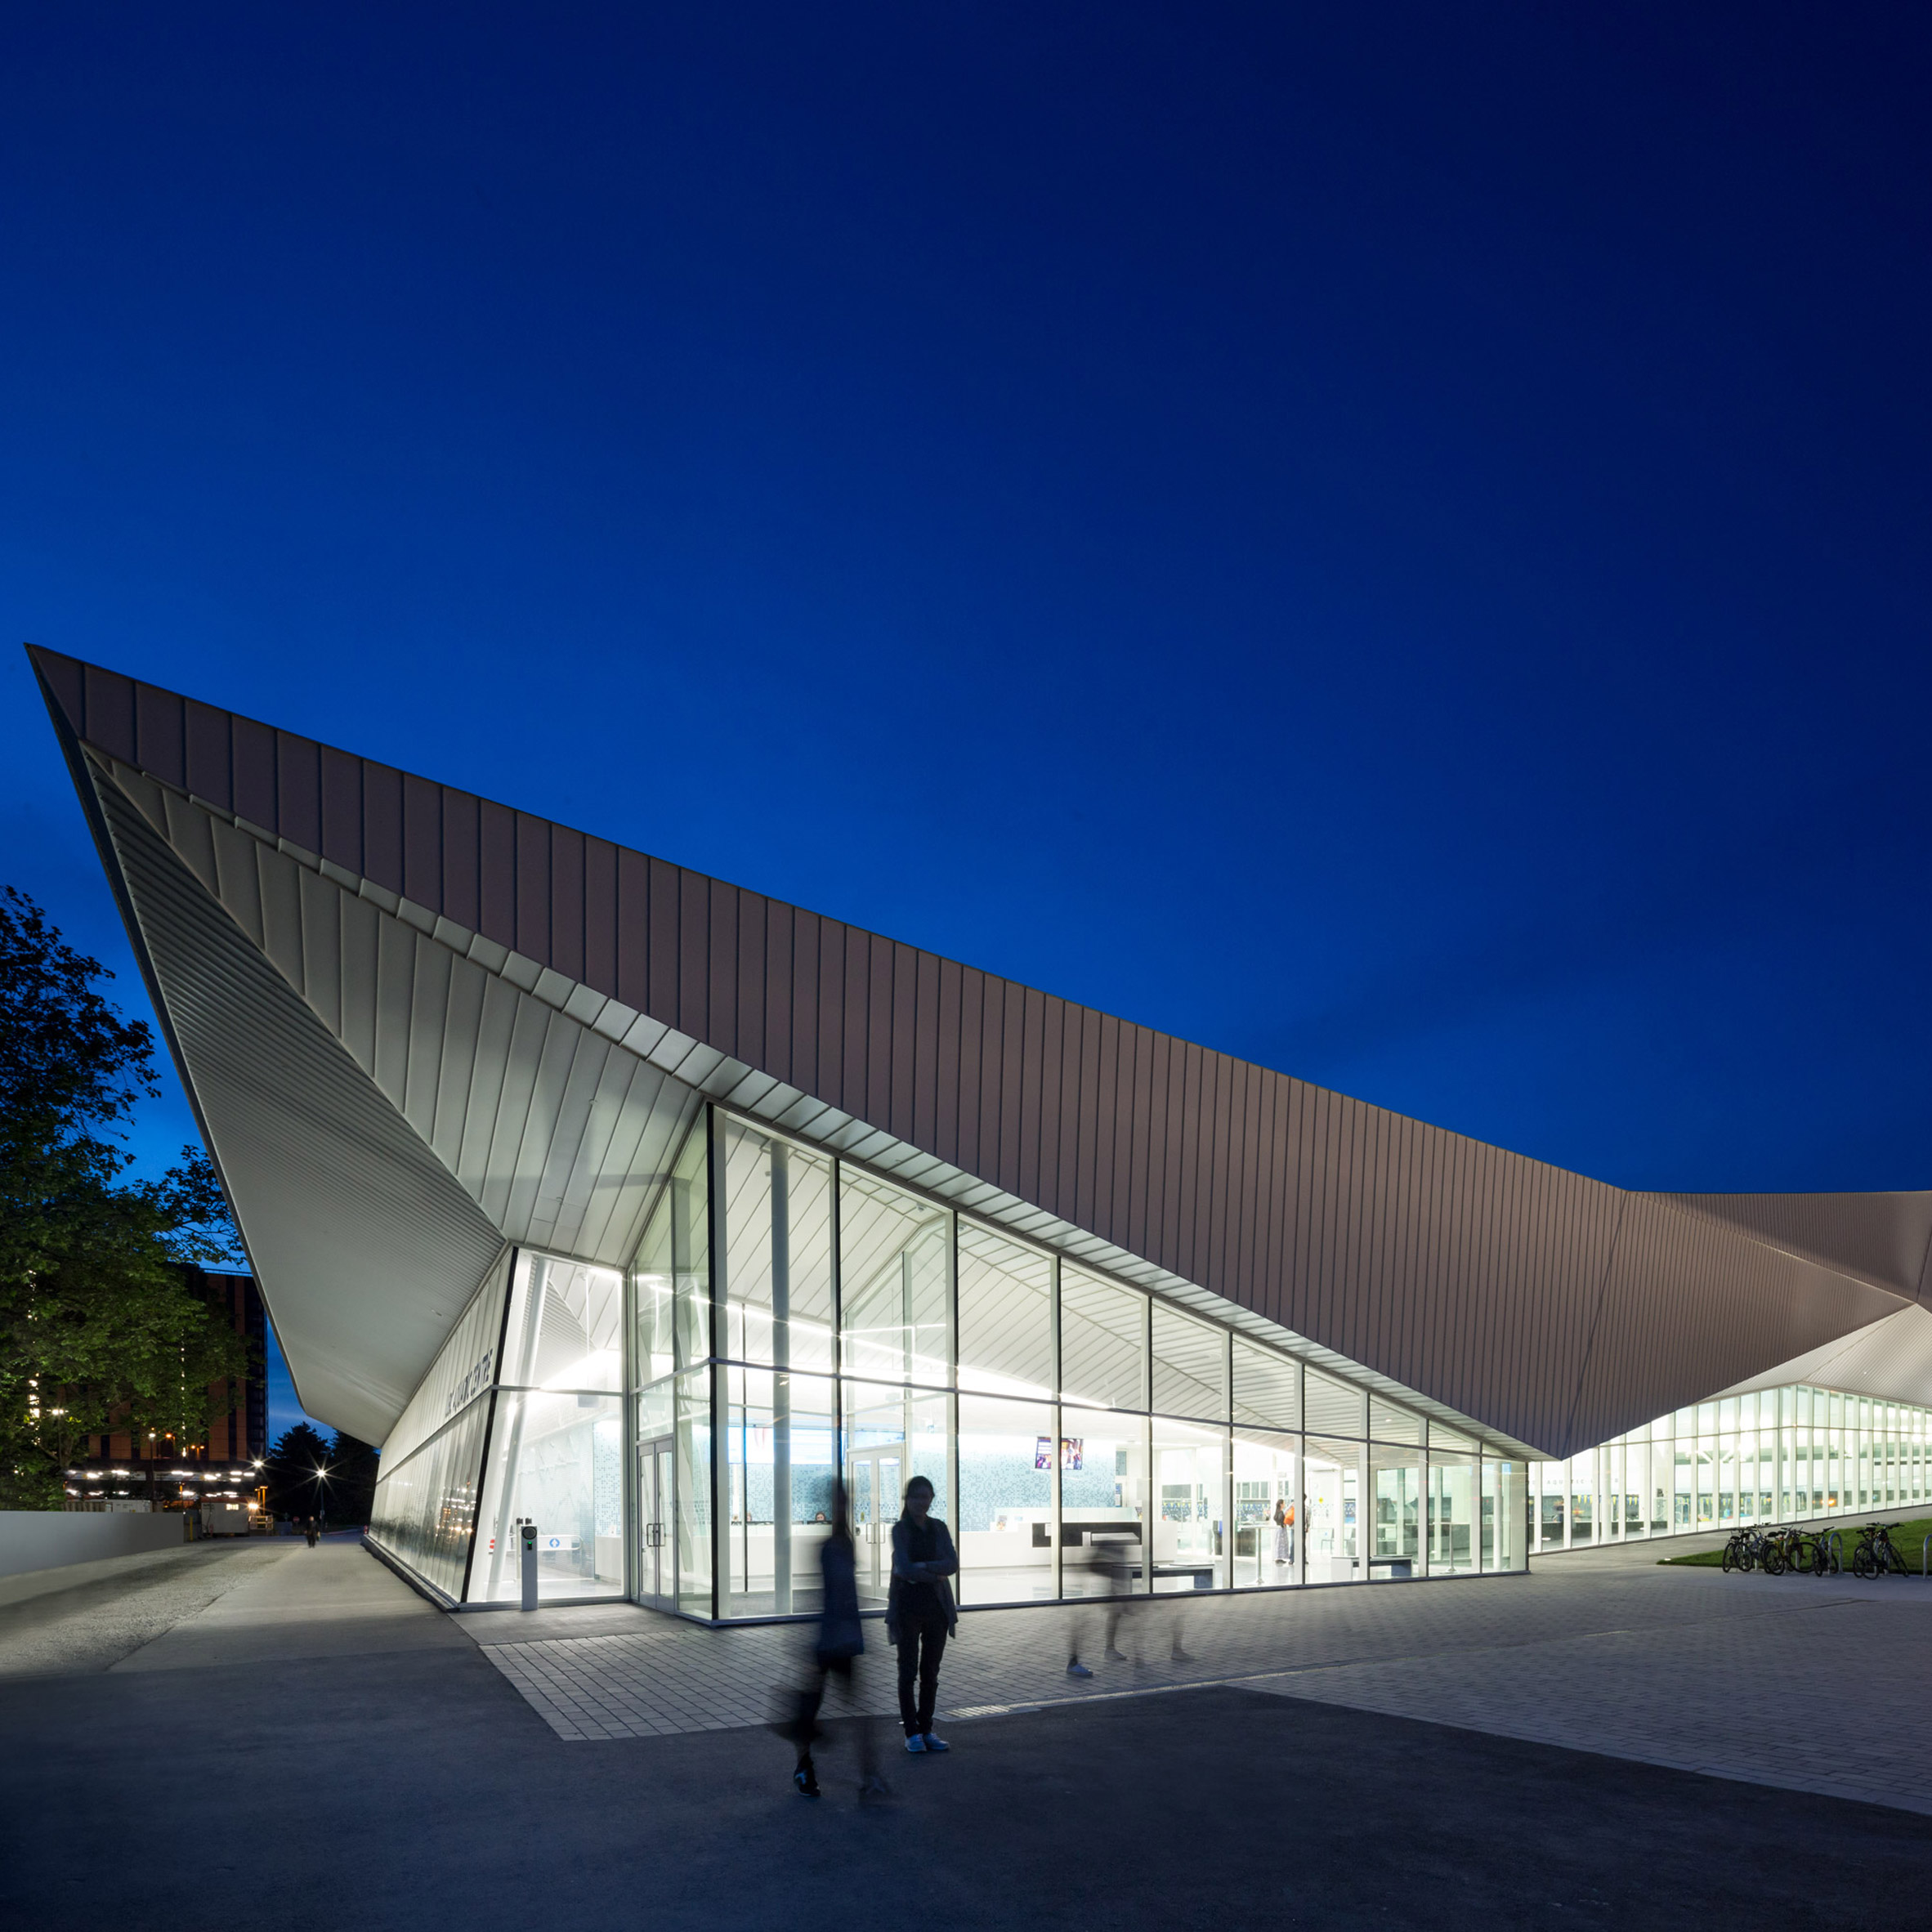 Swimming pool design and architecture | Dezeen